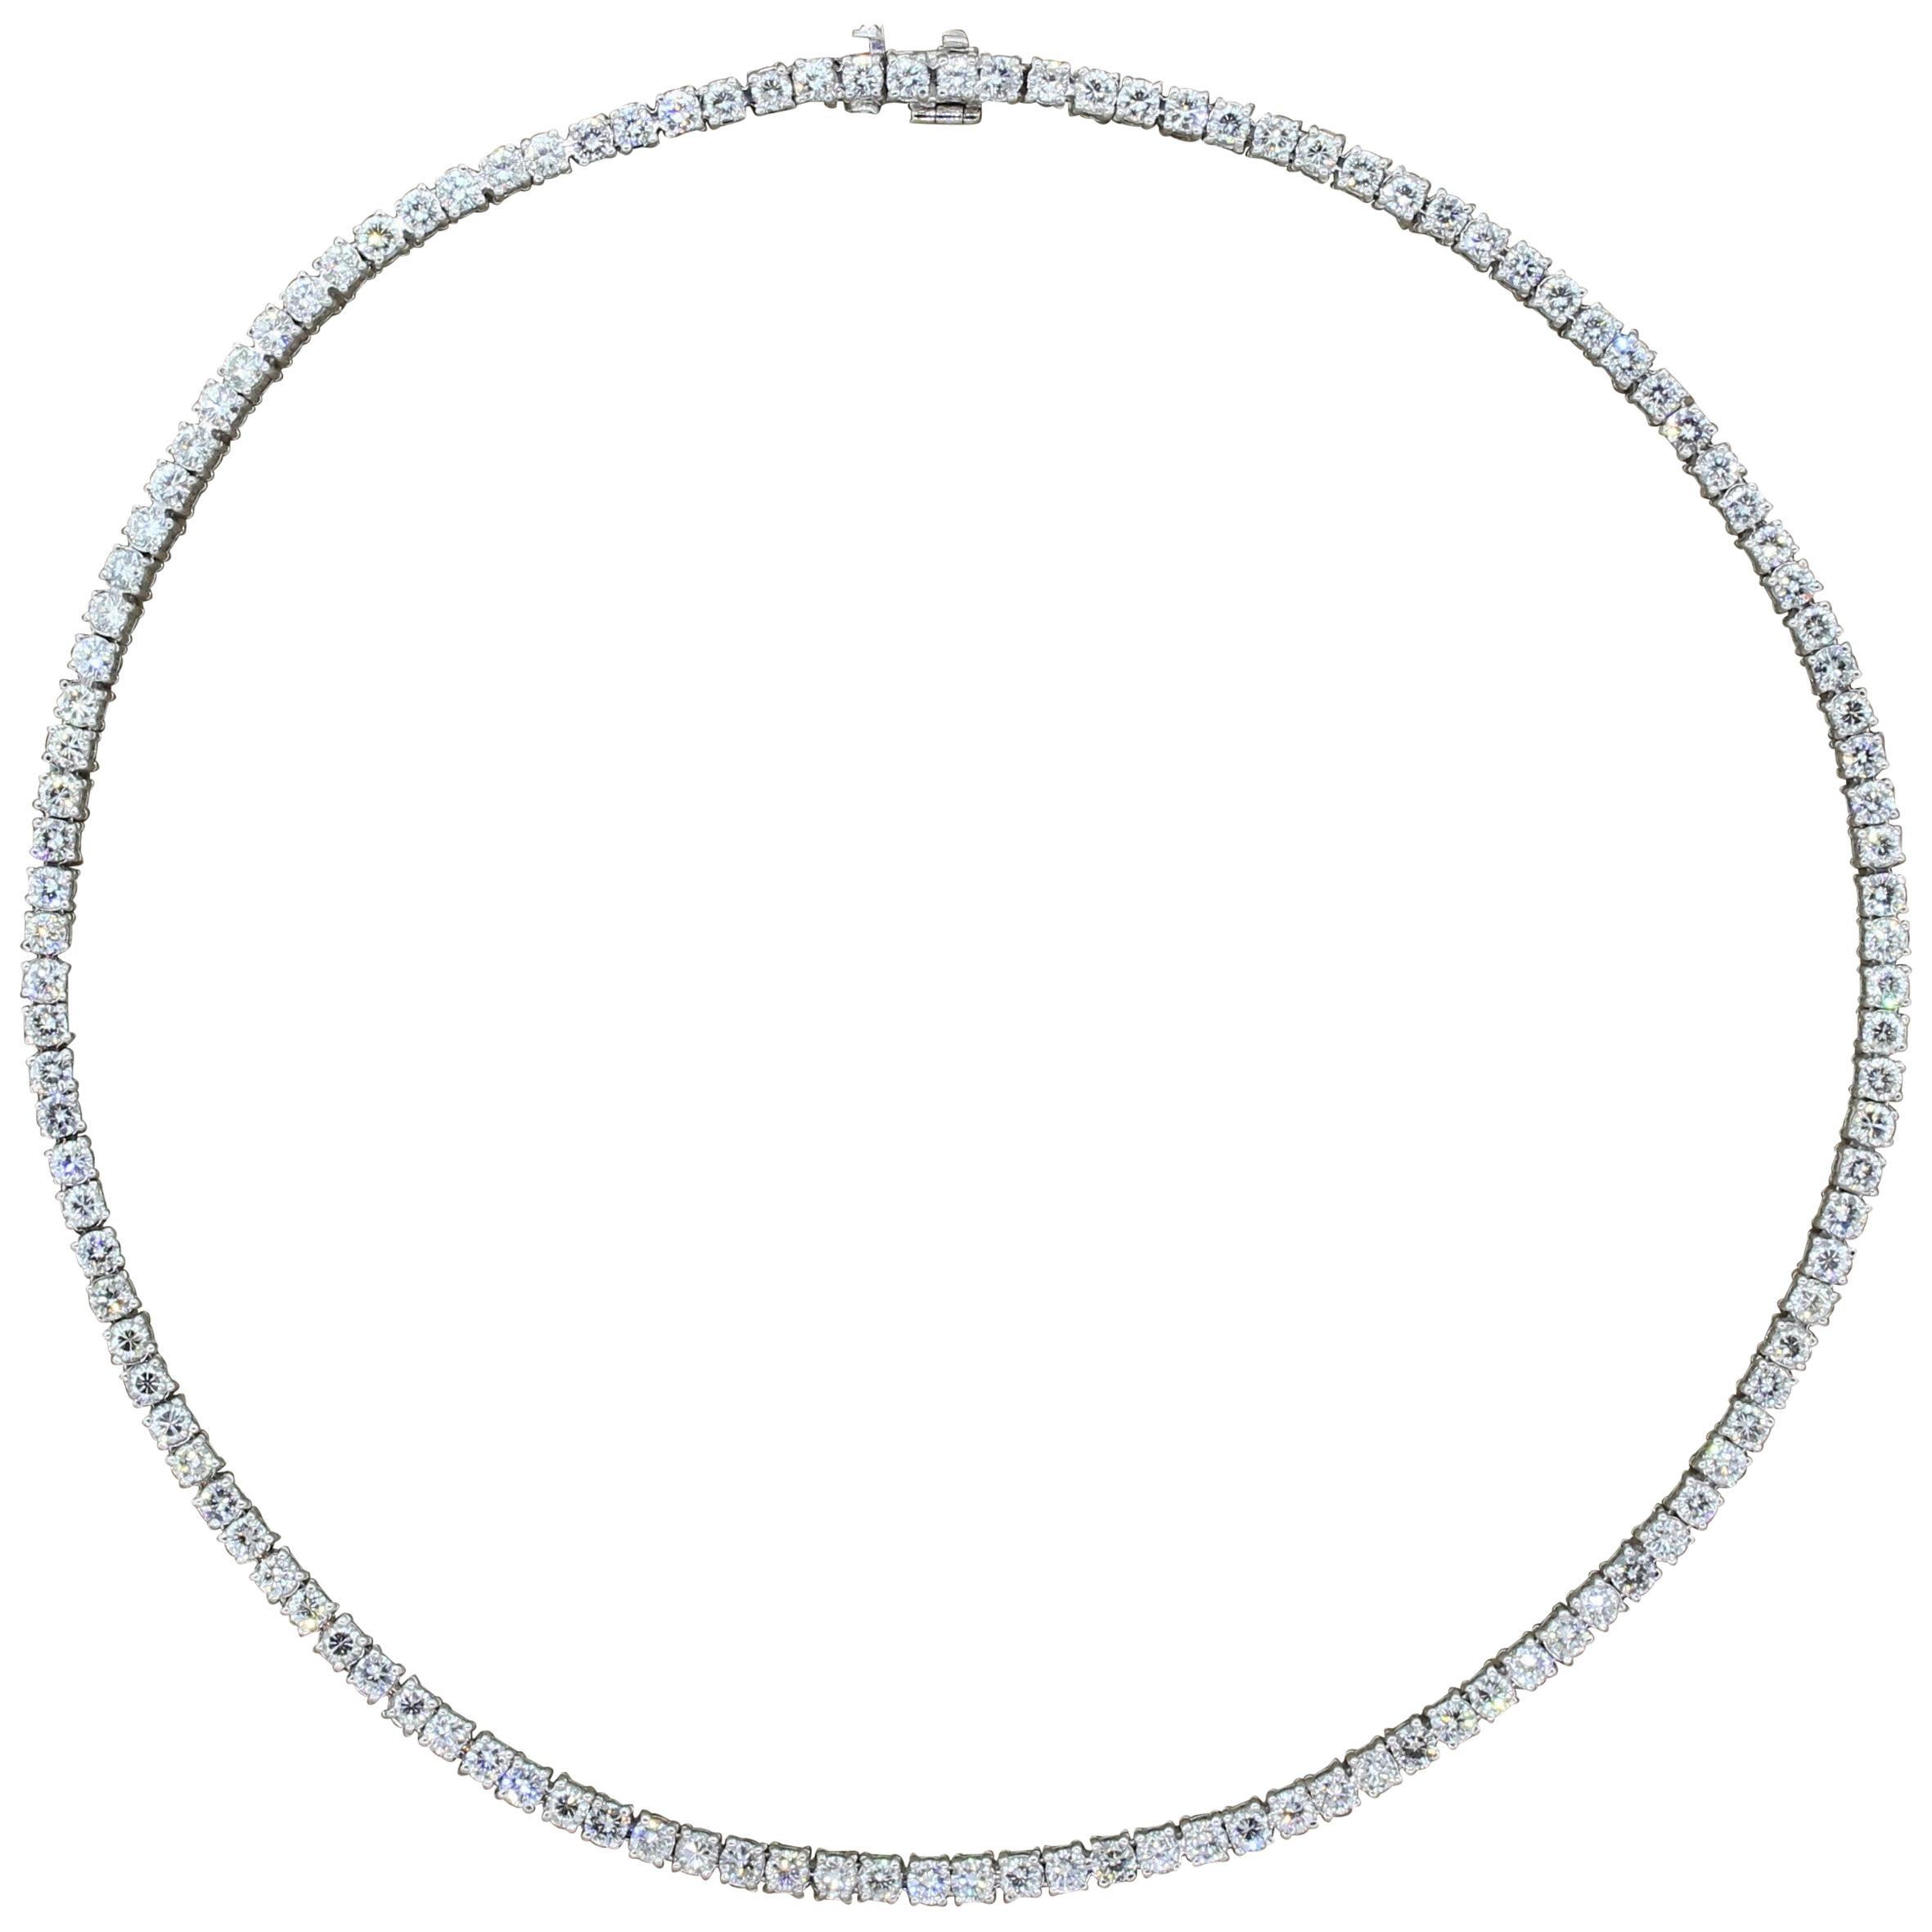 Diamond Platinum Tennis Necklace